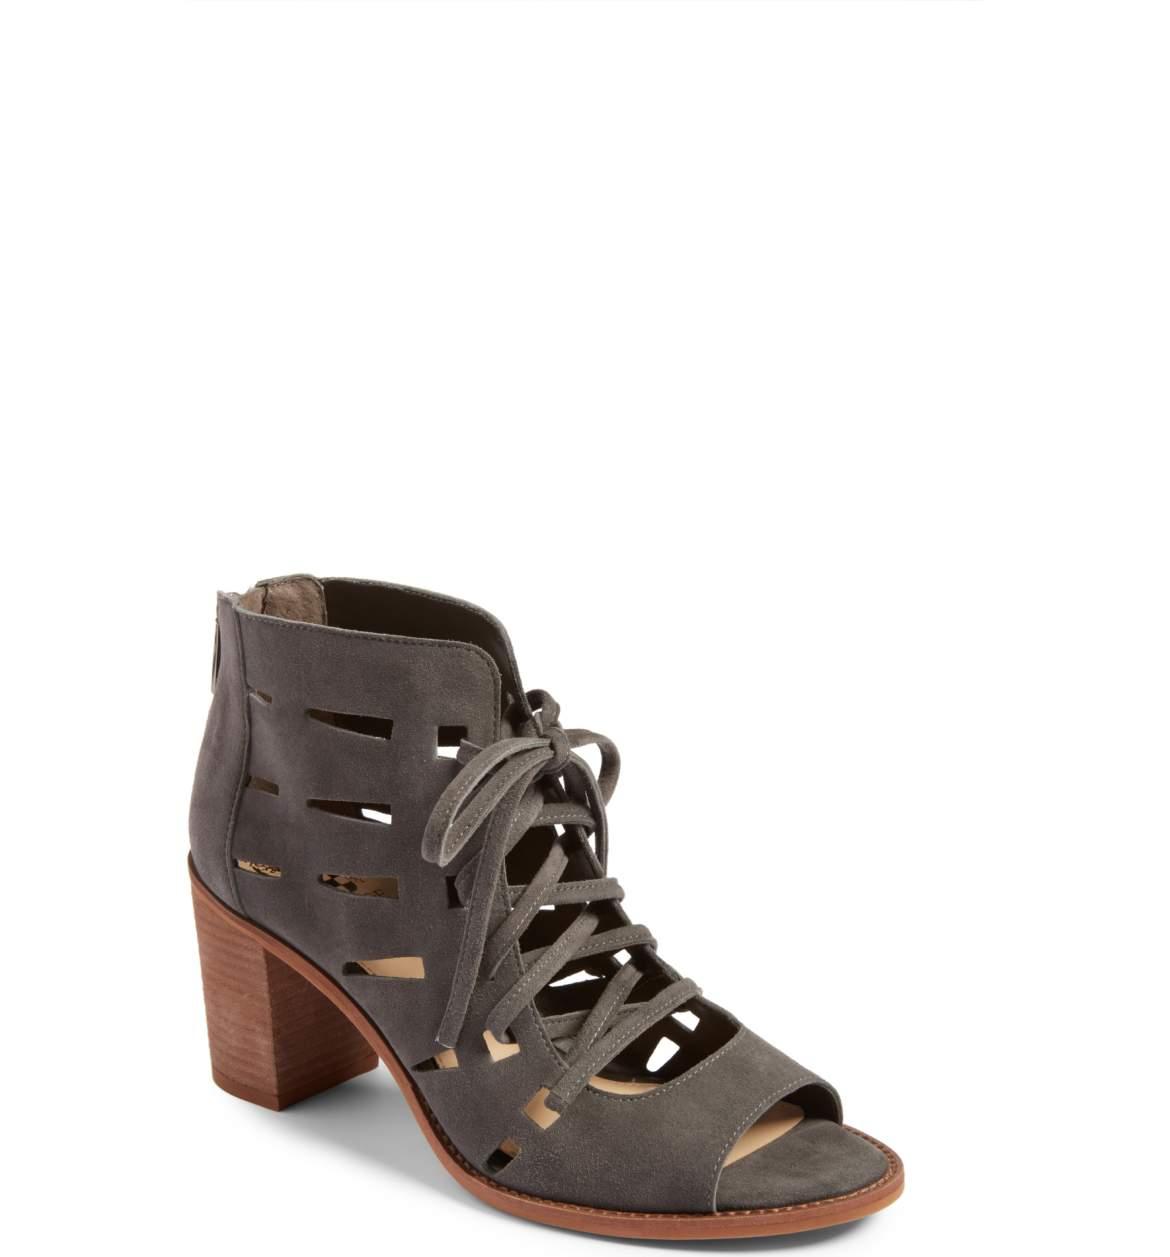 the best block heels under $100 | the best stacked heels under $100 | the best pumps of the Nordstrom Anniversary Sale 2017 | The best heels from the Nordstrom Anniversary Sale 2017 on allweareblog.com